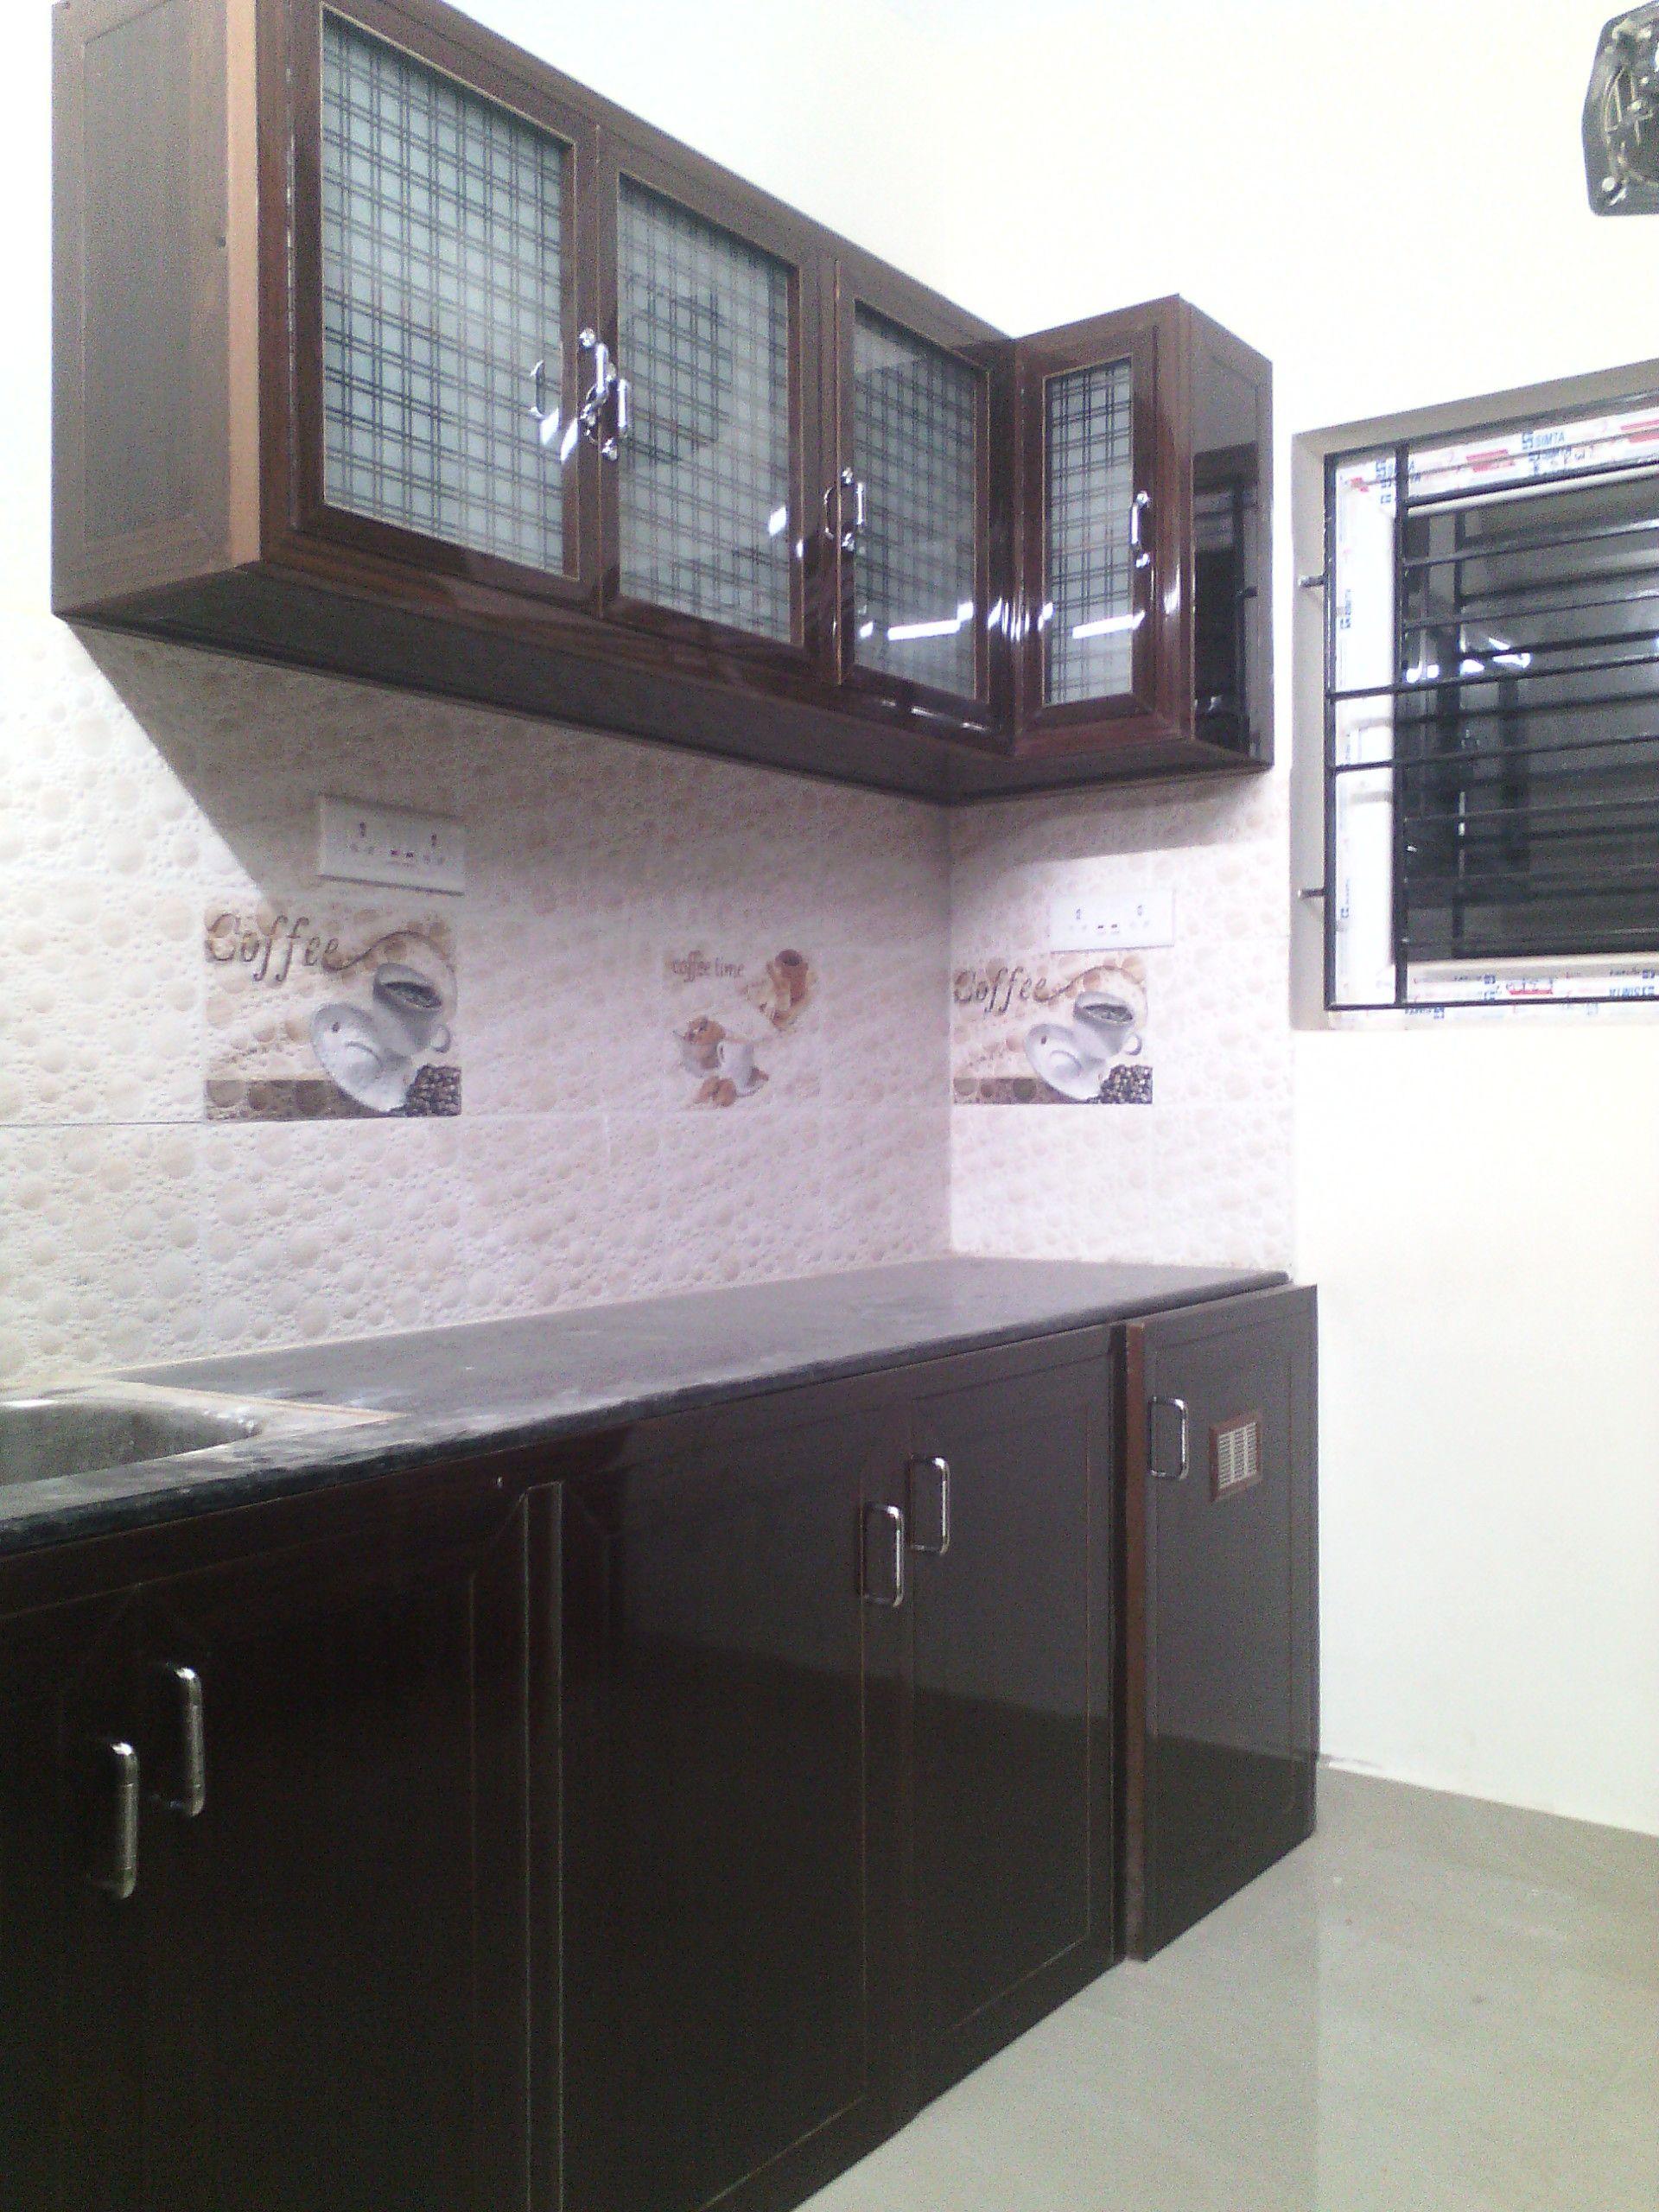 Budjet Pvc Modular Kitchen In Chennai Cupboard Design House Construction Plan Kitchen Cabinets Units